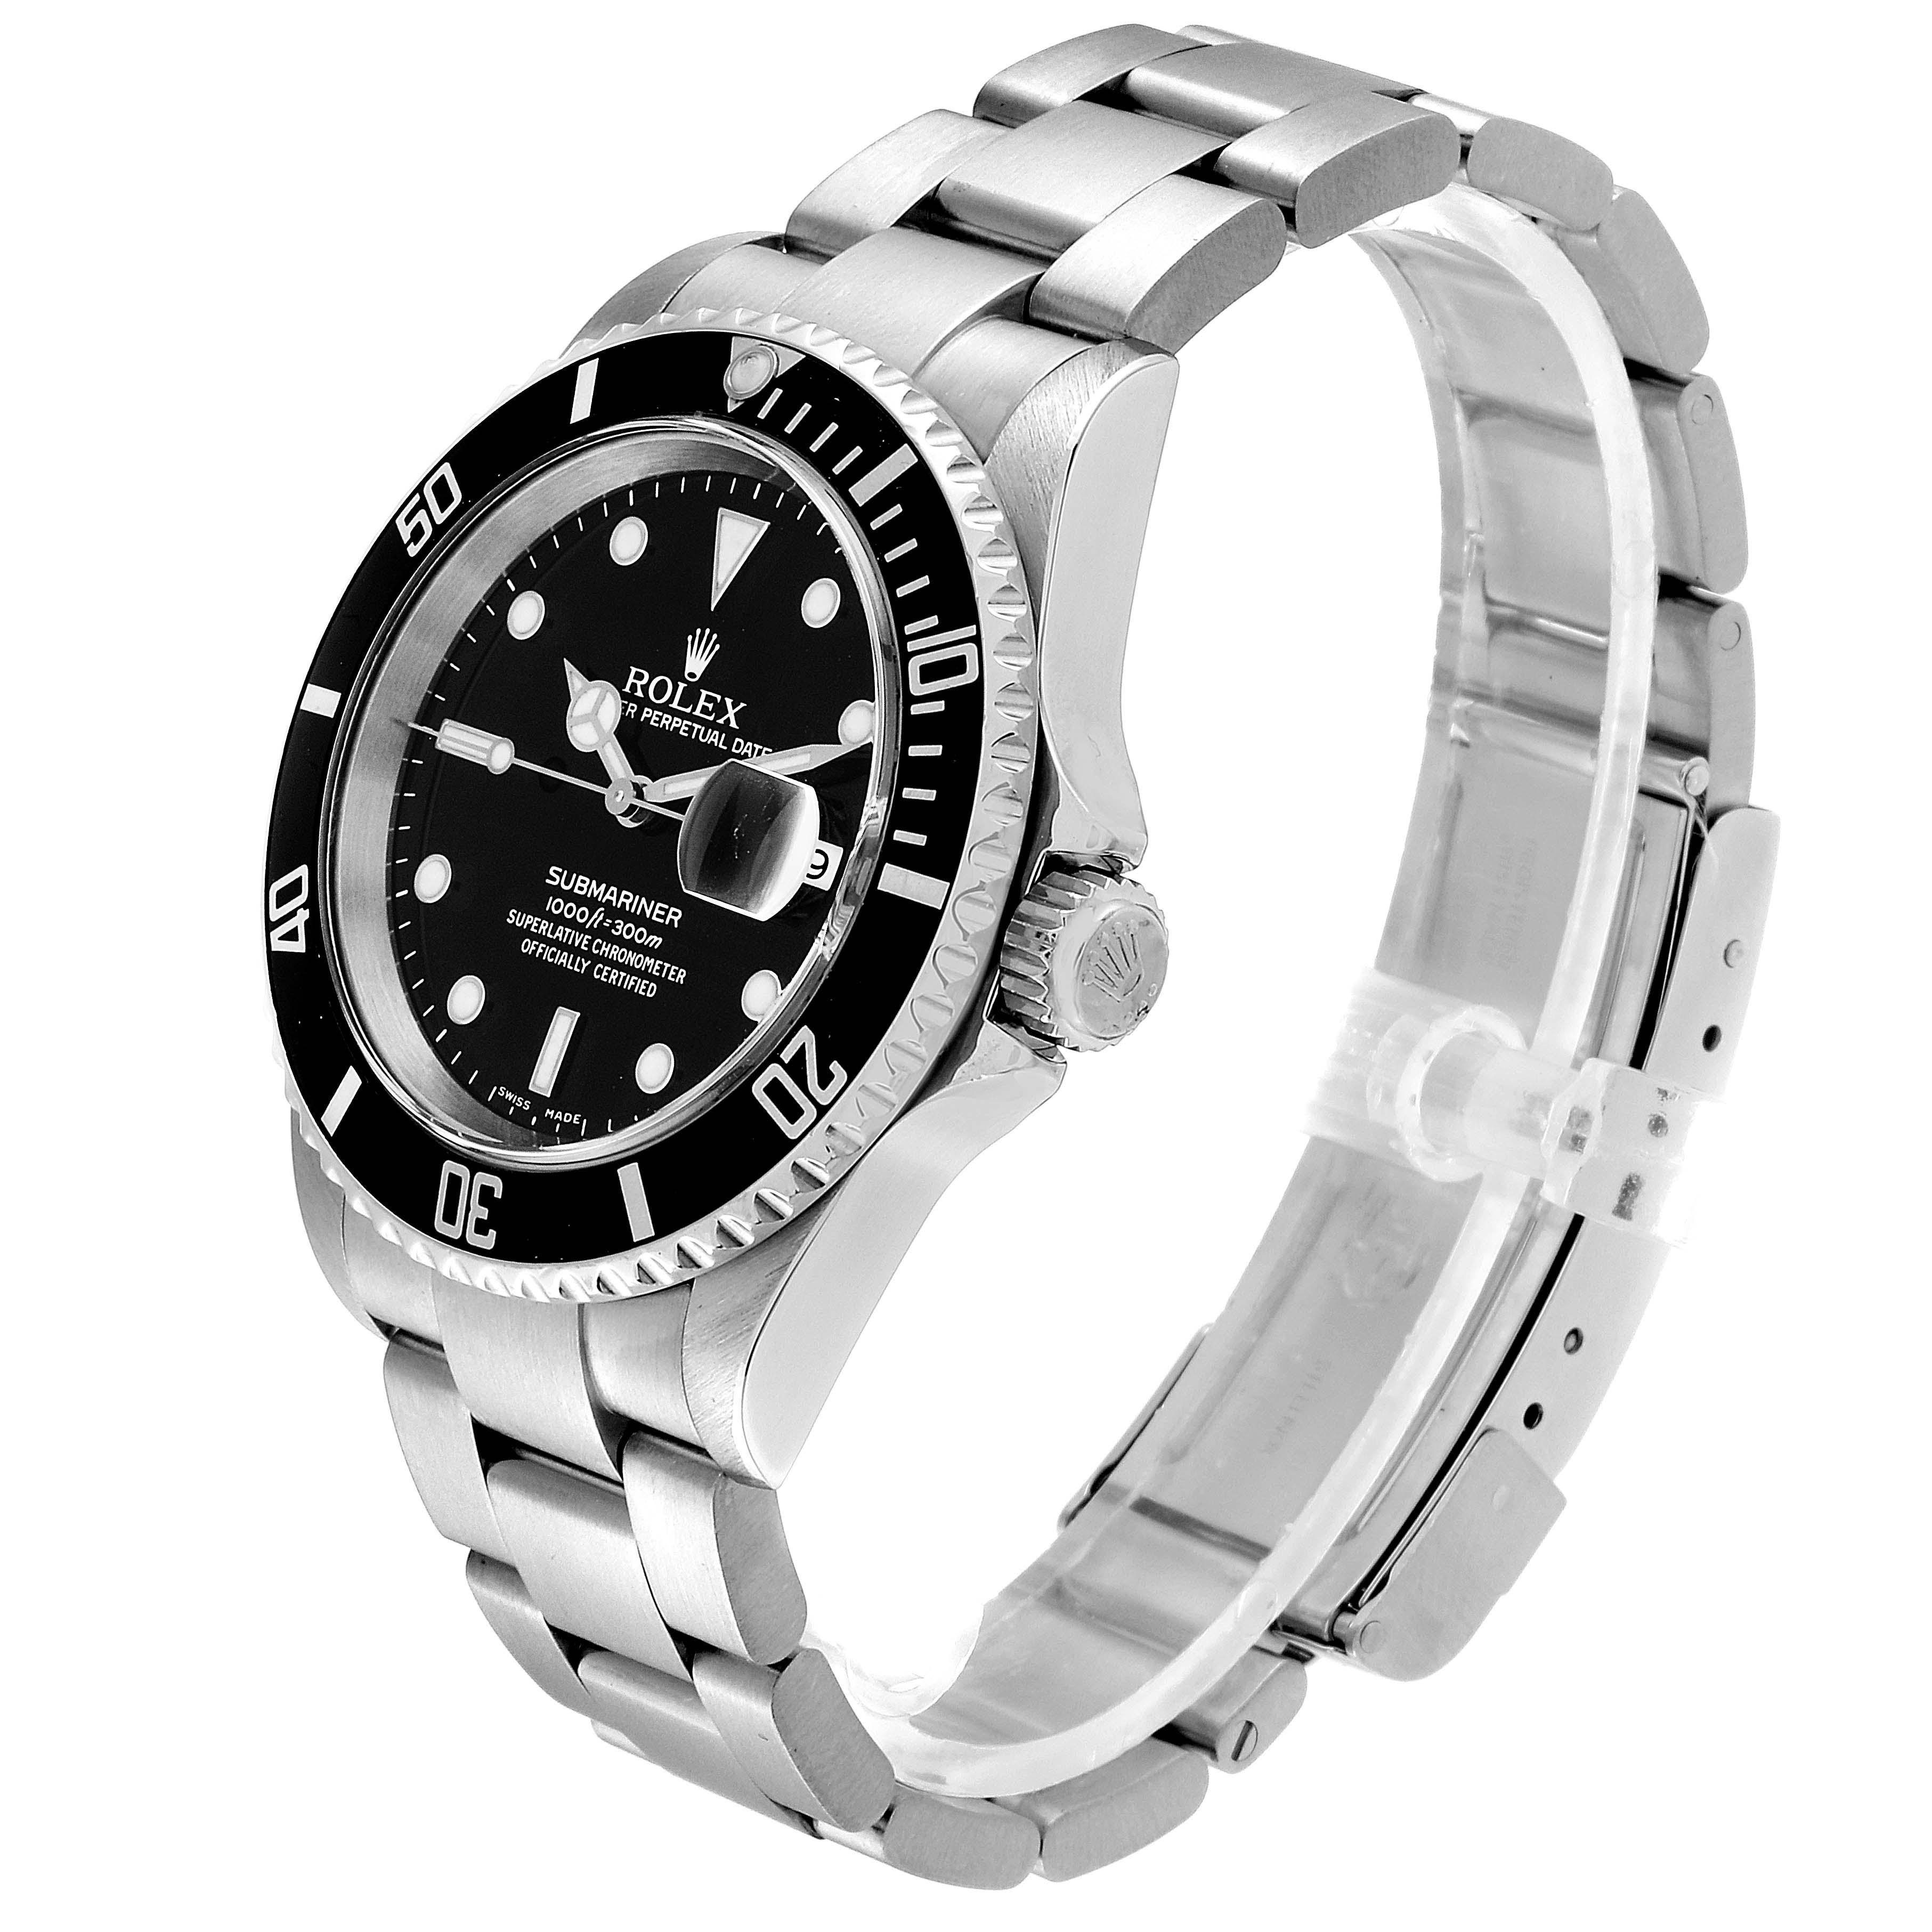 Rolex Submariner Date 40mm Stainless Steel Mens Watch 16610 SwissWatchExpo